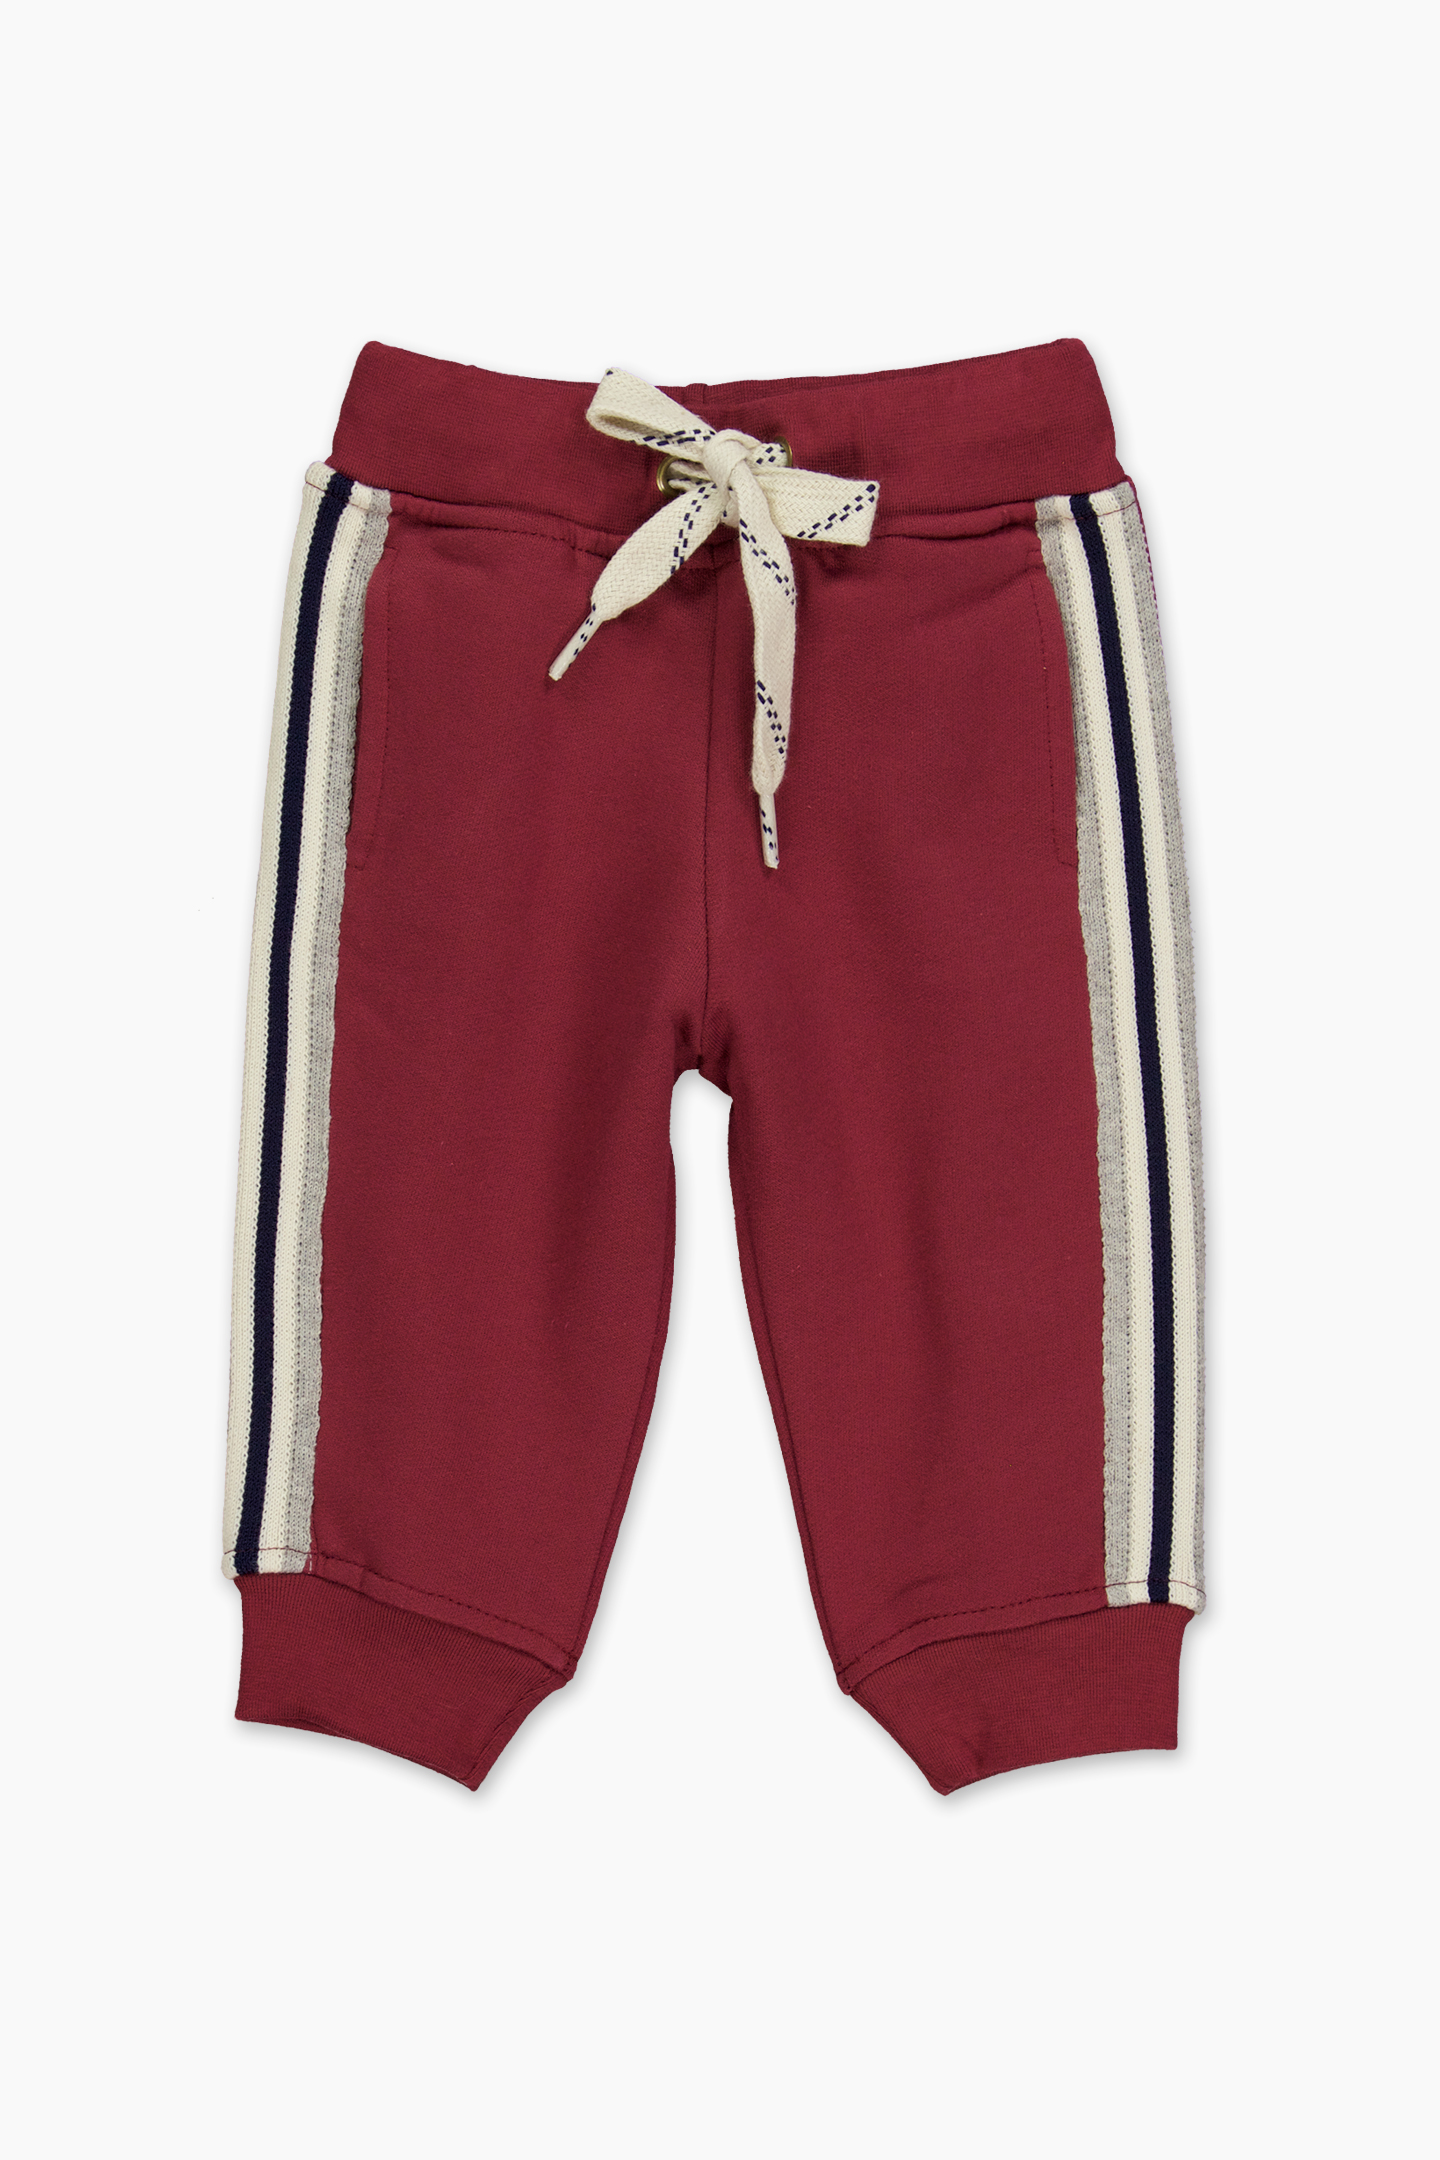 cheeky_pantalon-jog-ulises-m-xxl_40-25-2019__picture-33206